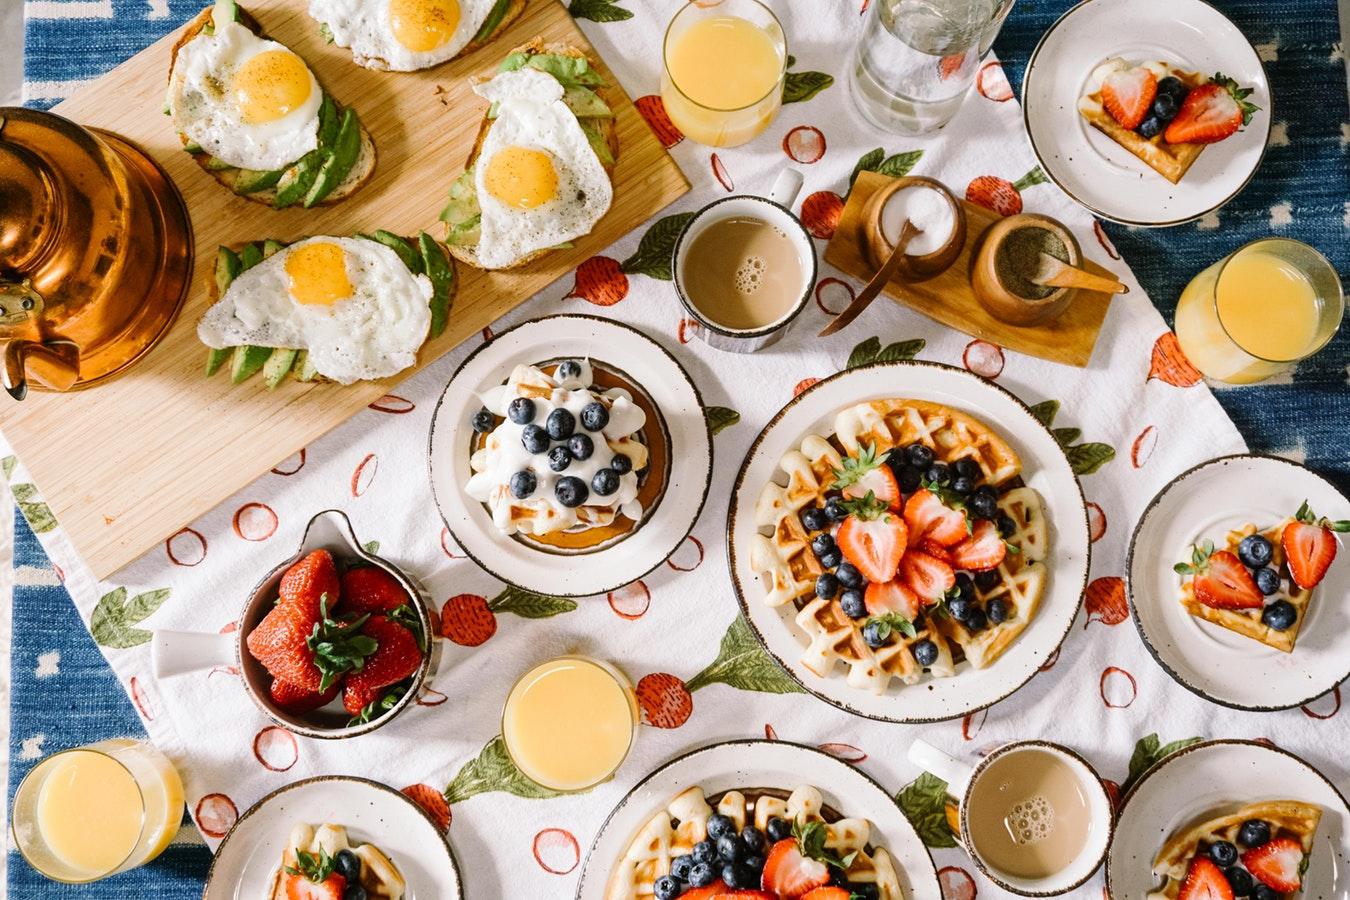 waffles pancakes berries coffee and eggs brunch lunch breakfast brunch keeping australians healthy